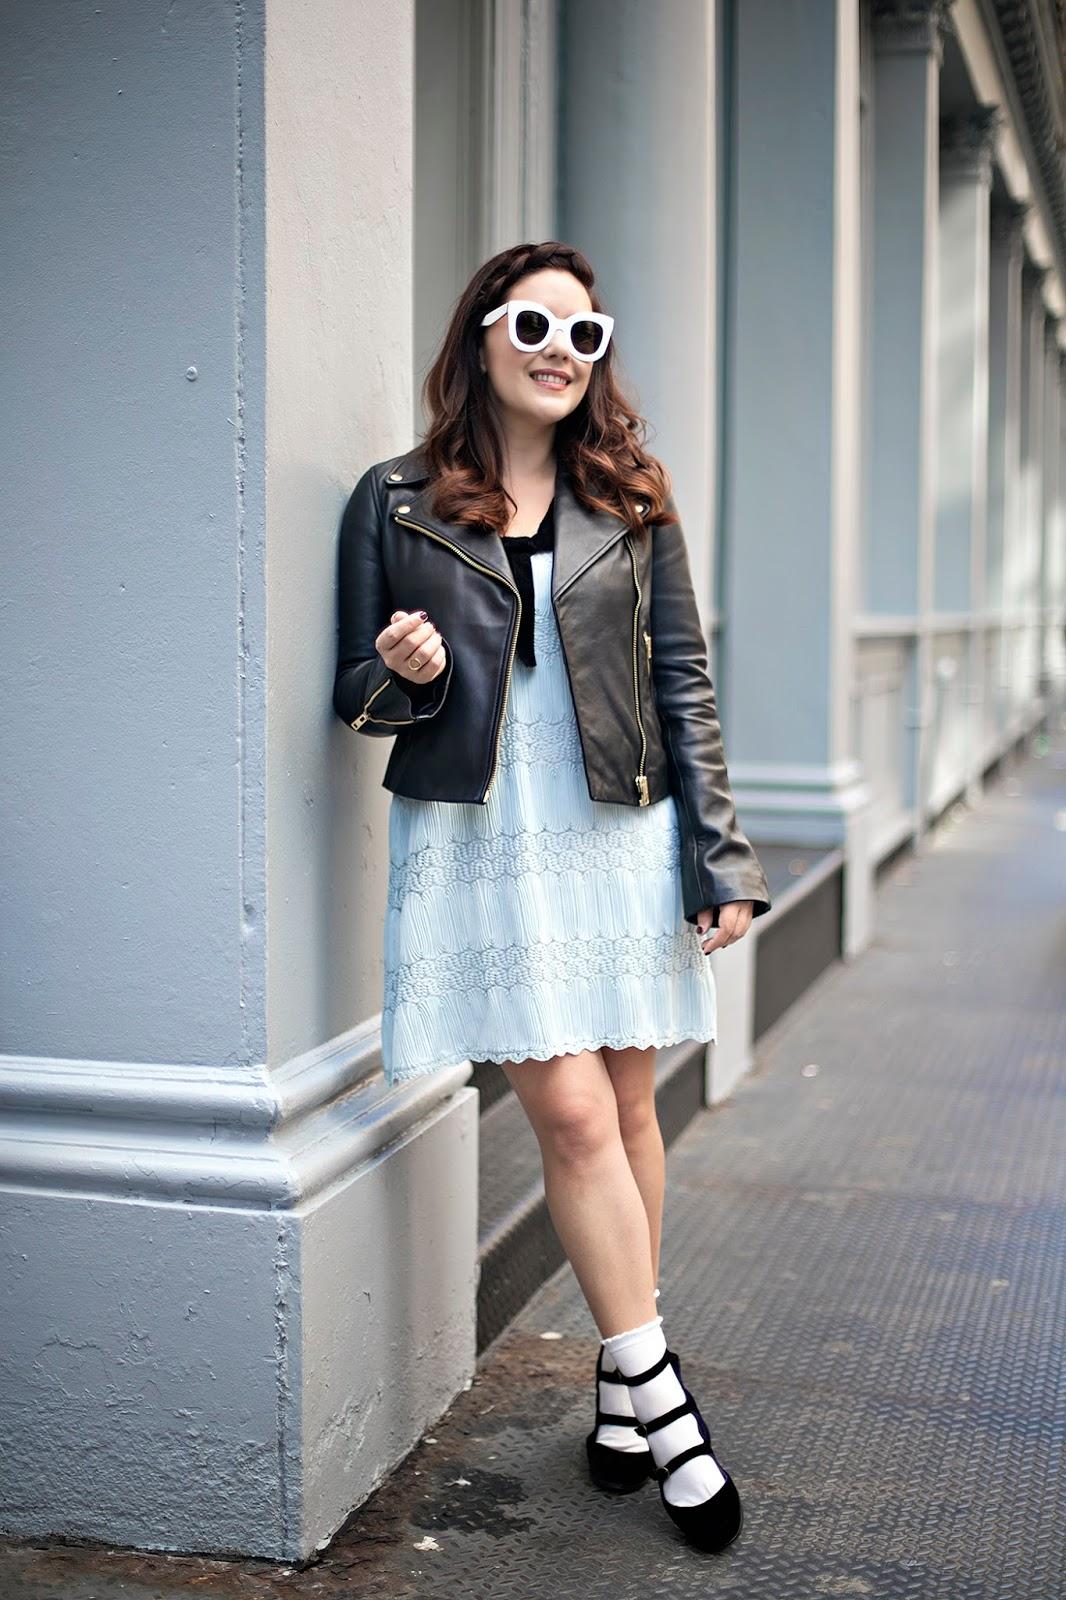 Fall Fashion Trends, Socks and Heels, New York City